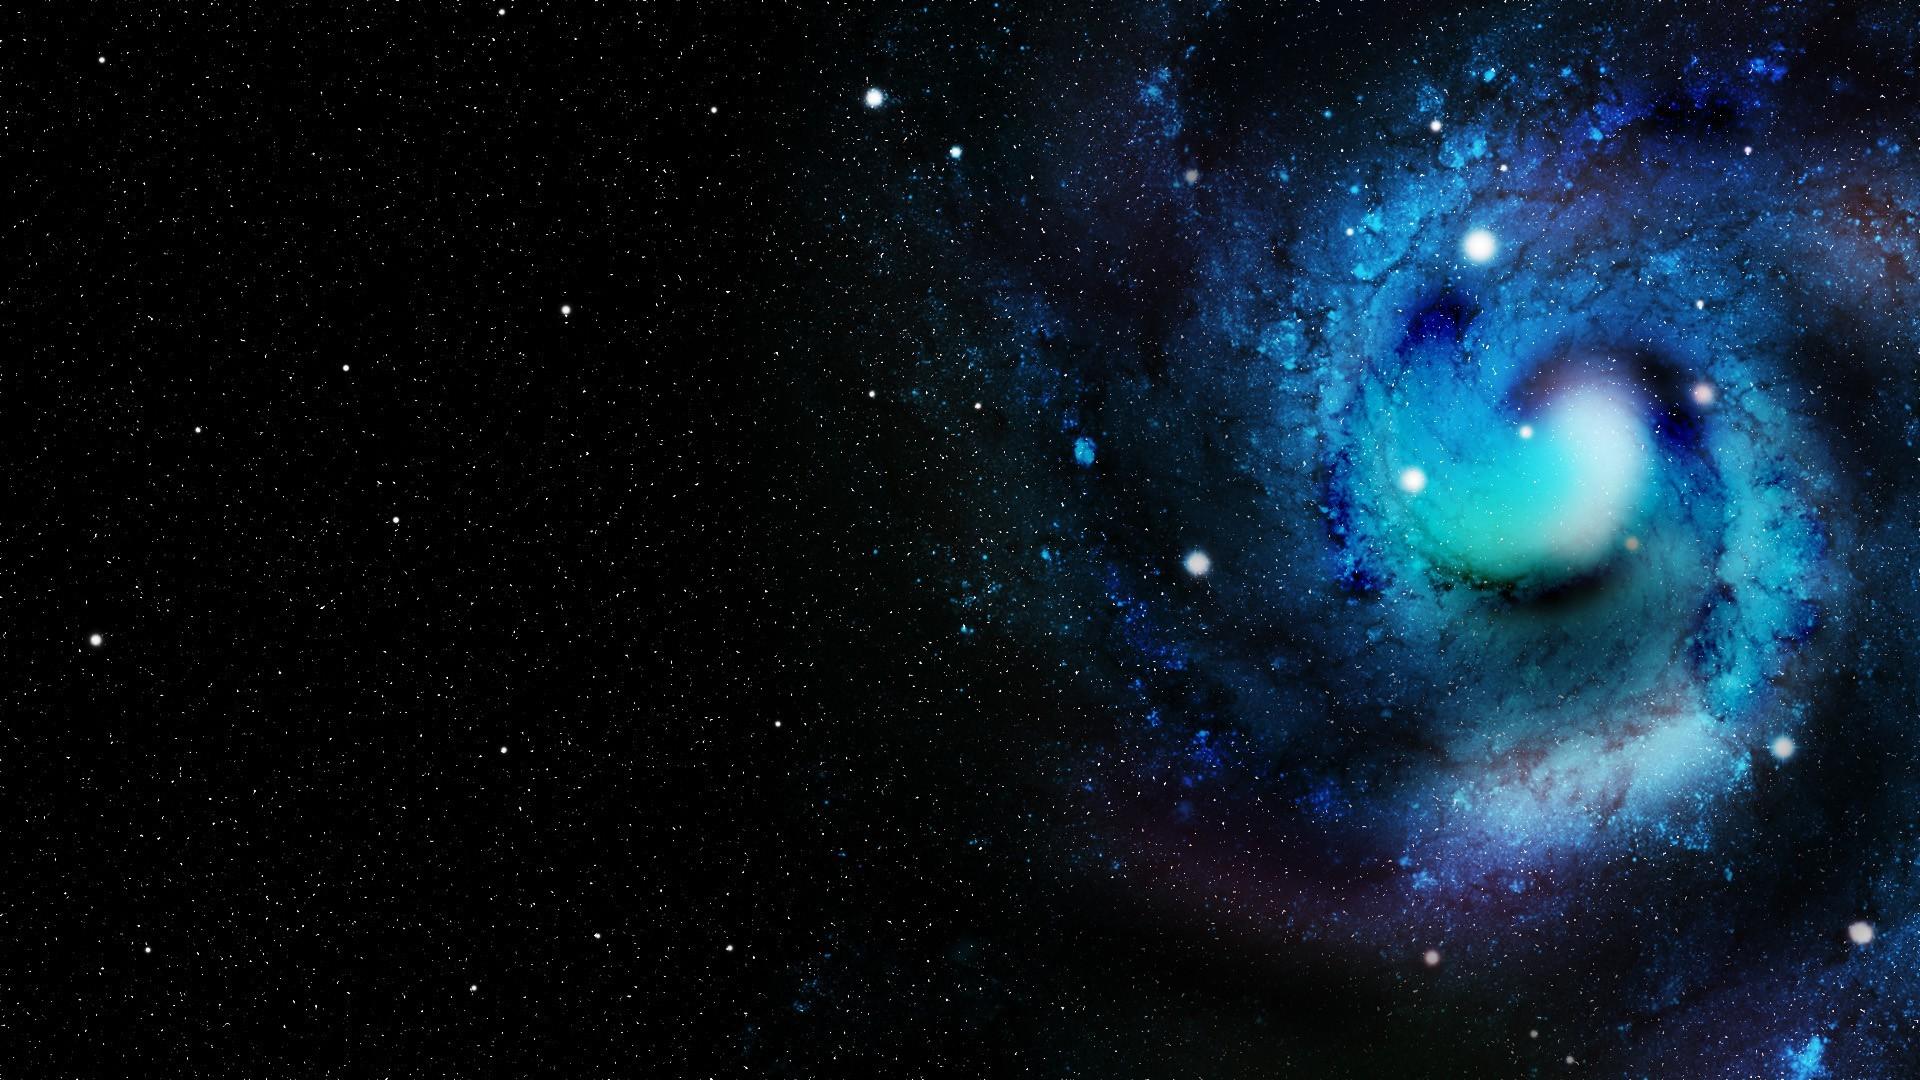 Обои На Телефон Галактика